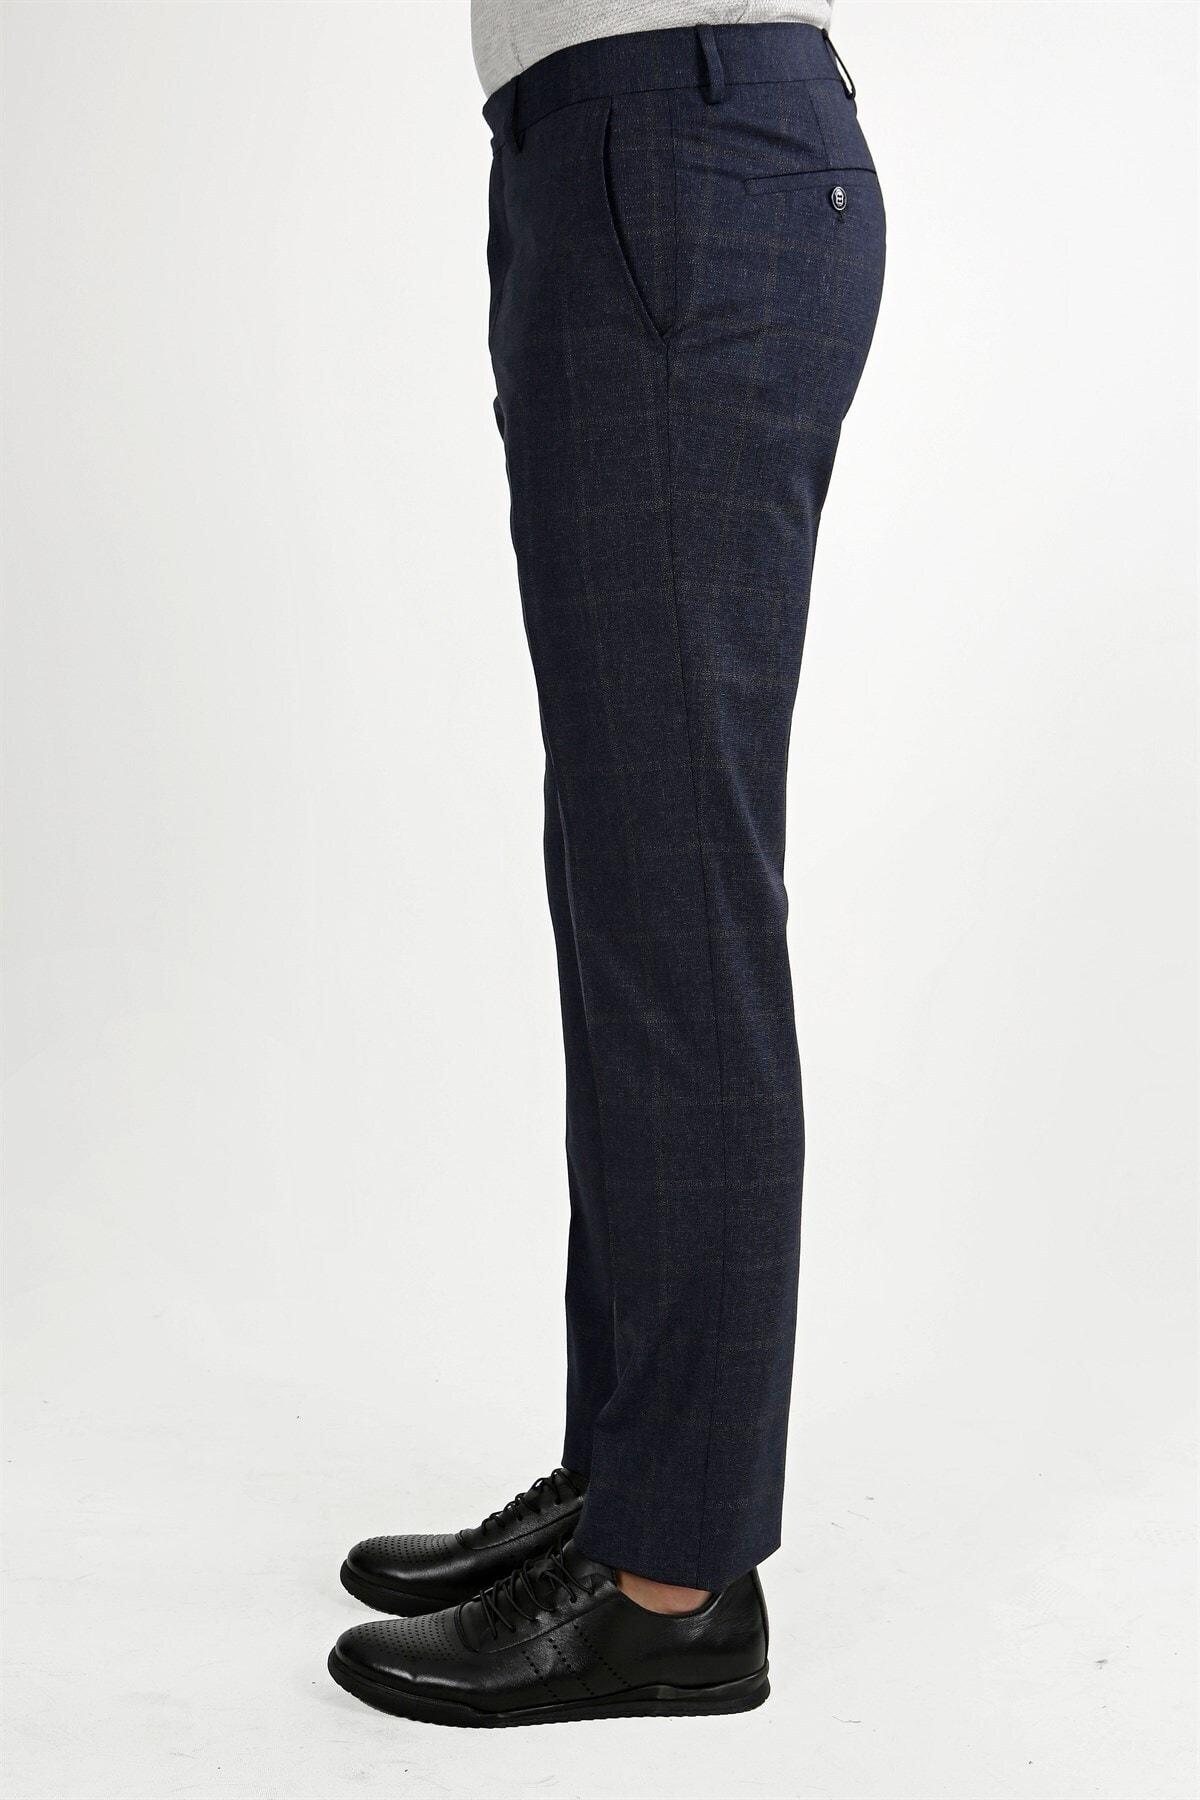 Jakamen Lacivert Klasik Kalıp - Regular Fit Pantolon- Yan Cep 2